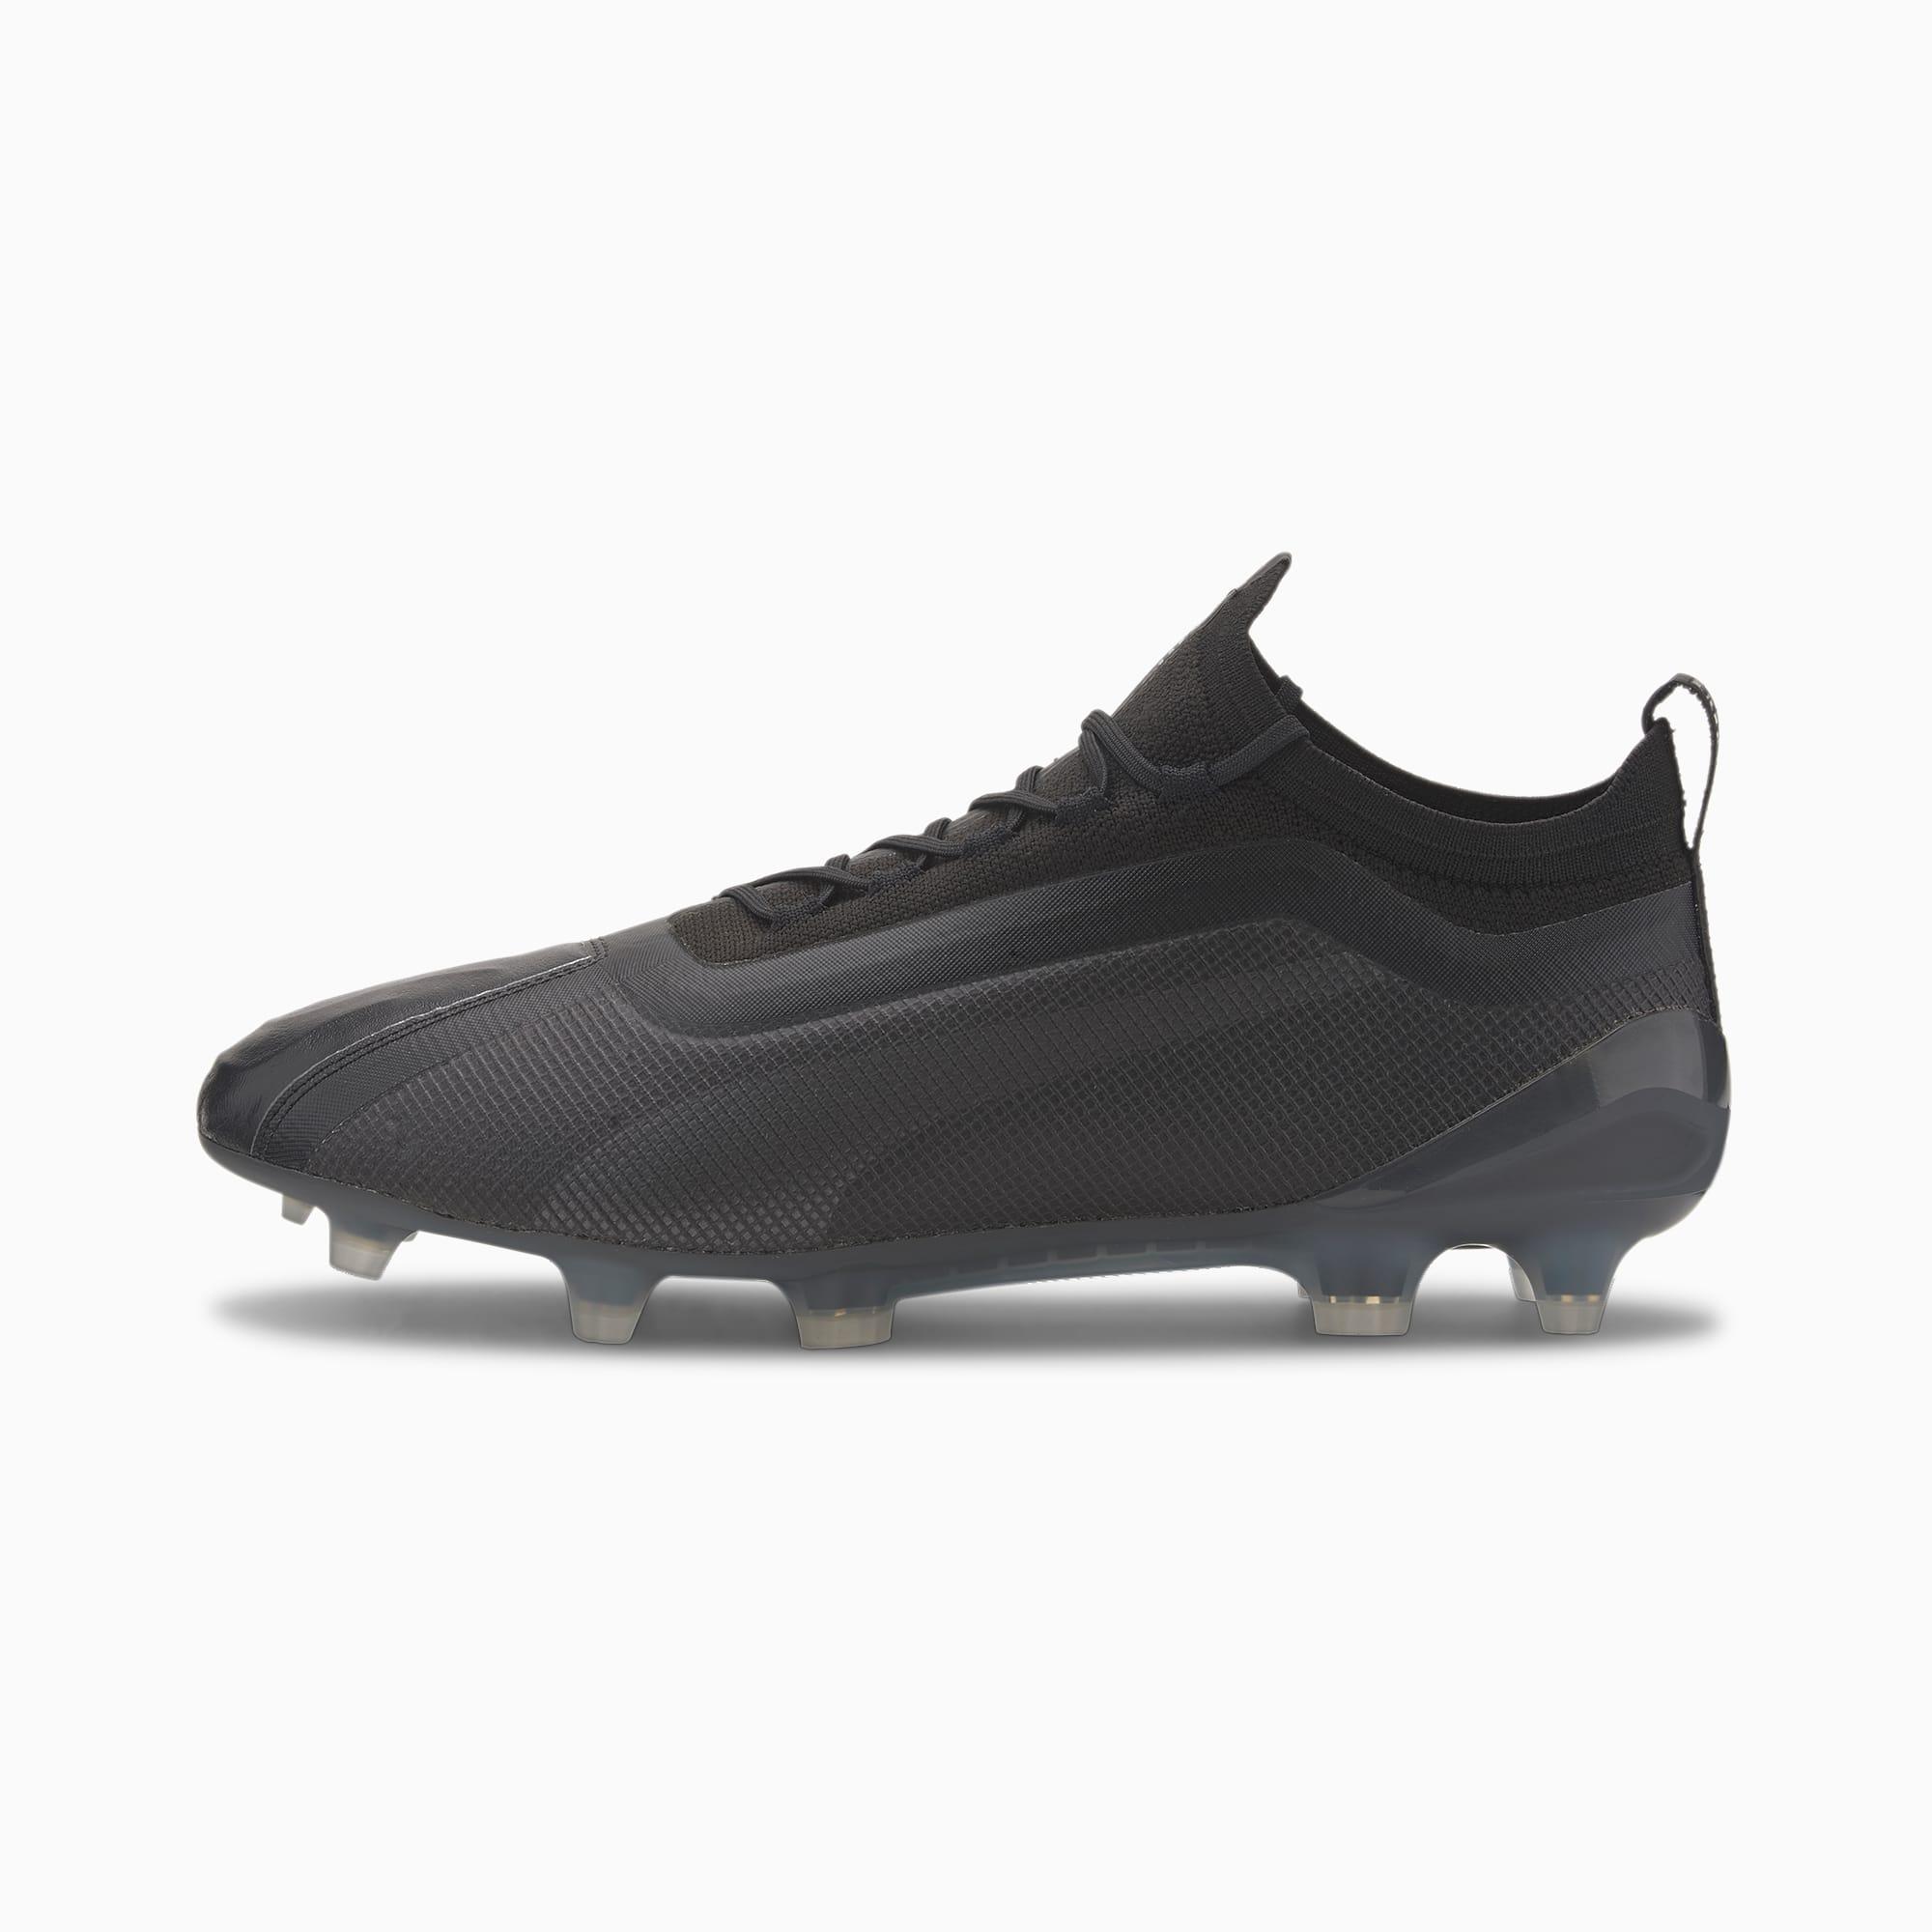 Puma ONE 1 Mens FG Football Boots